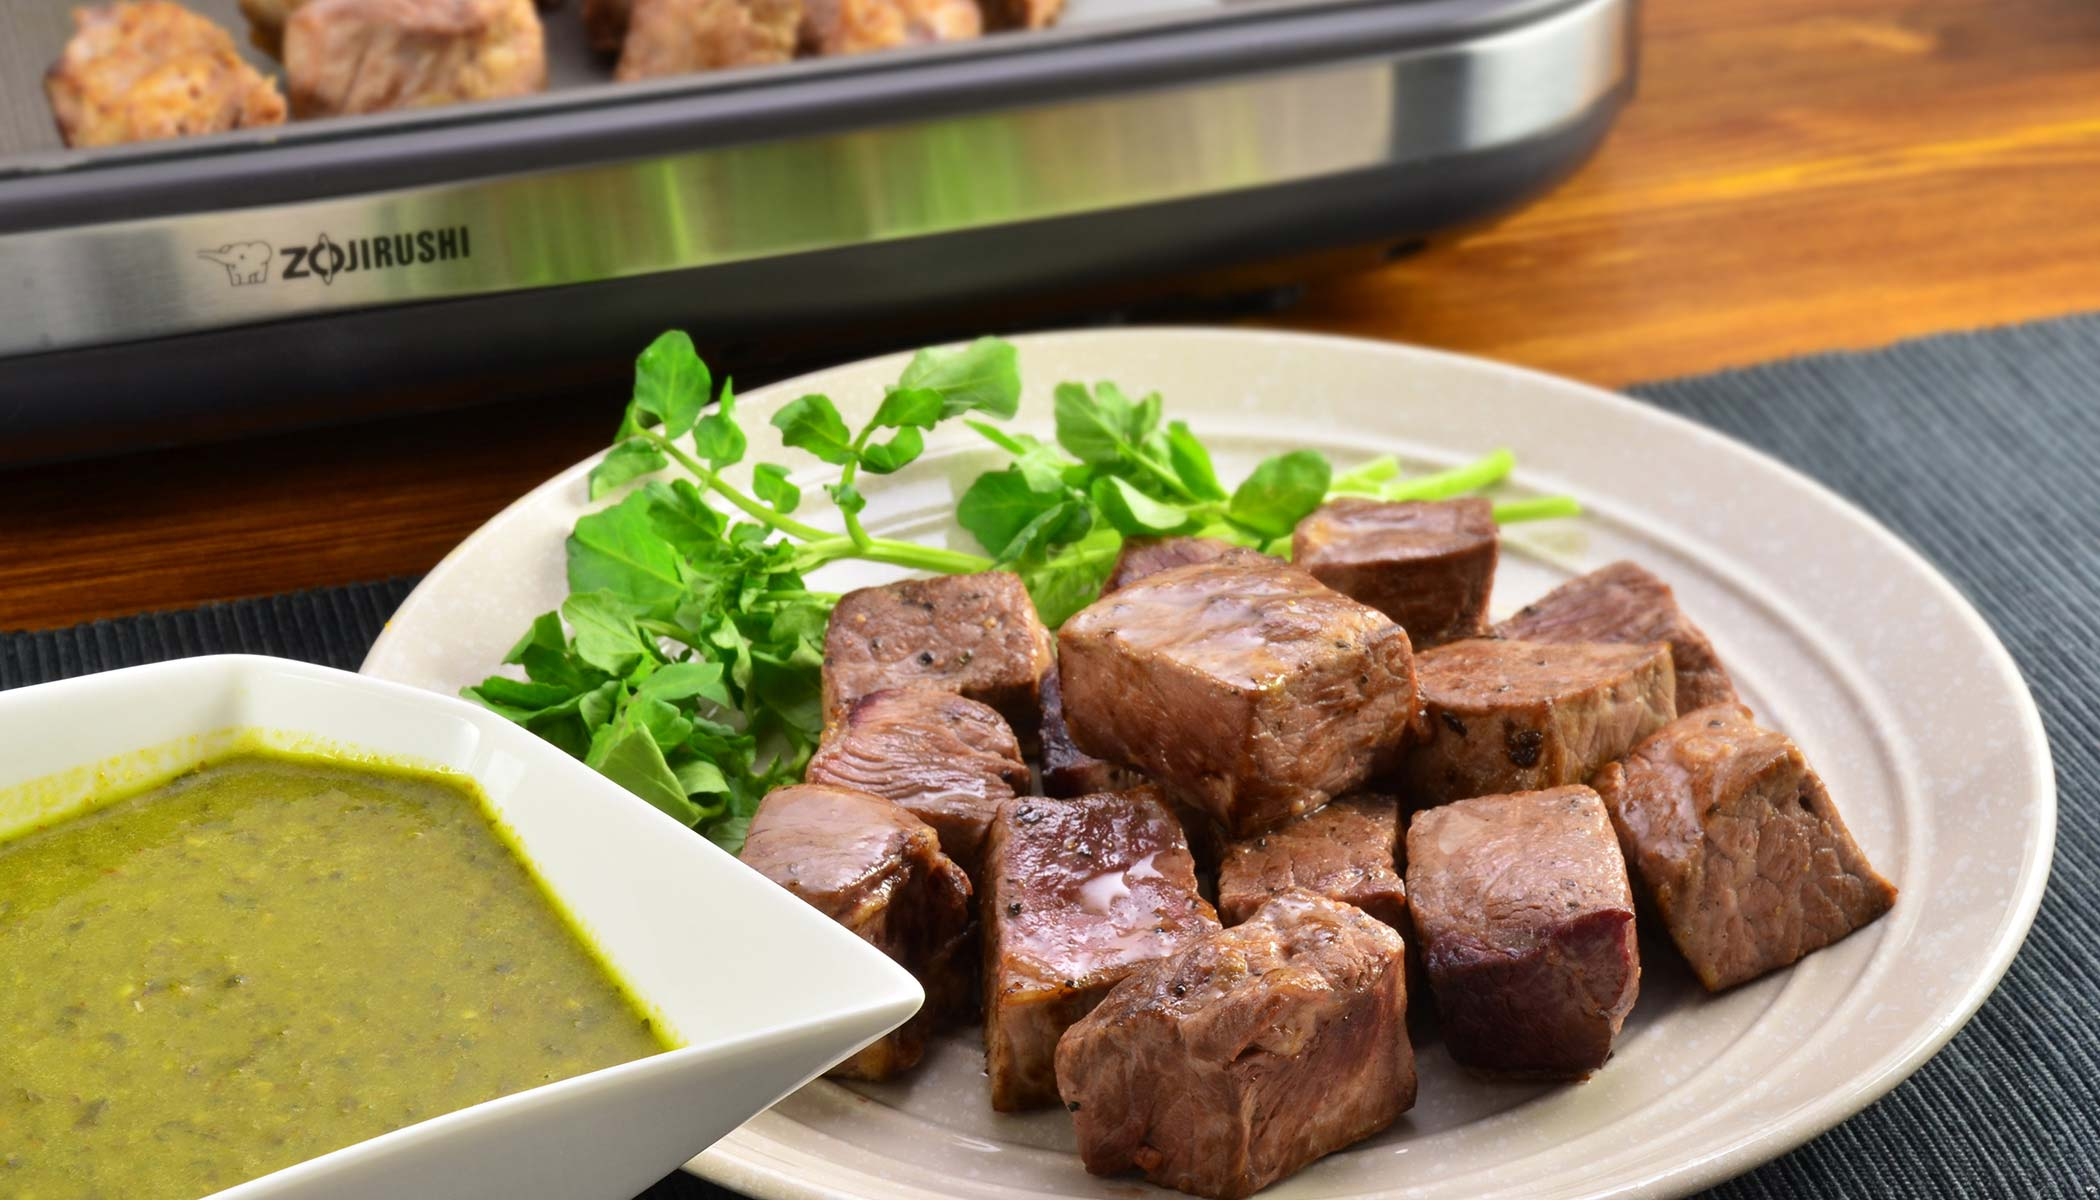 Diced Steak with <i>Chimichurri</i> Sauce